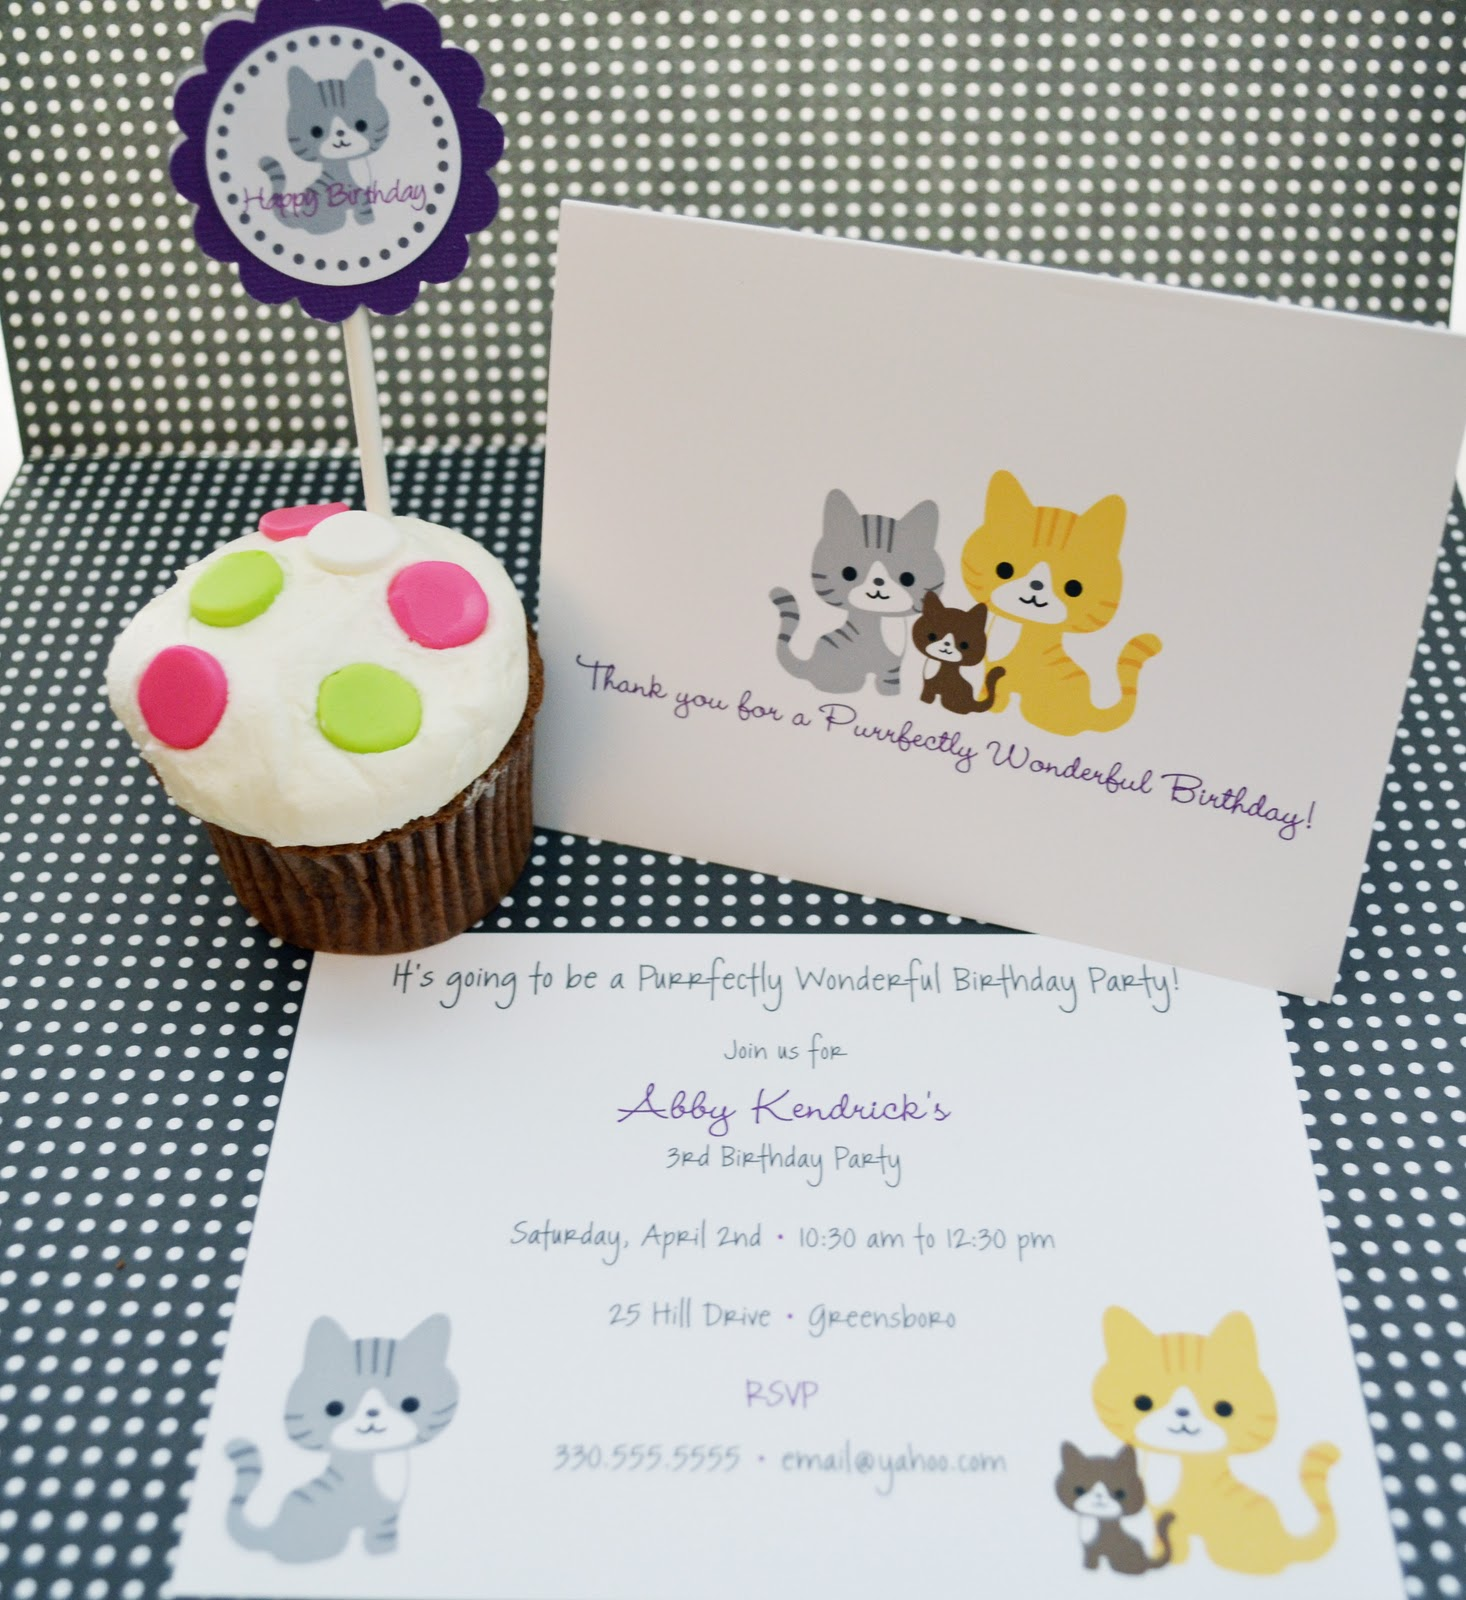 Kitty Party Invitations is luxury invitation sample